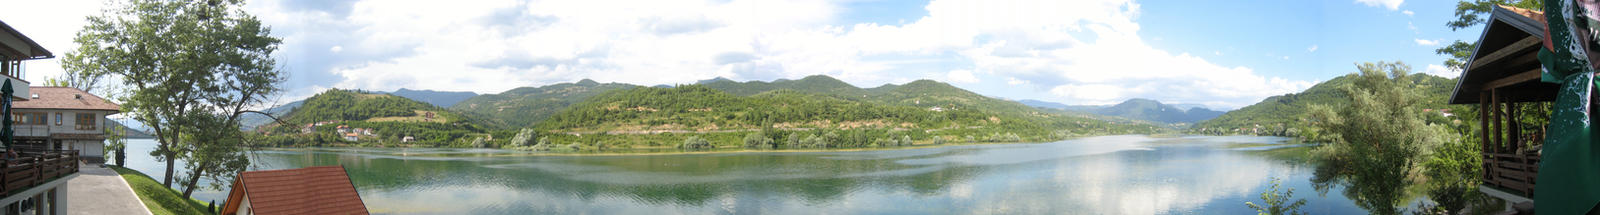 Jablanicko Jezero by eking